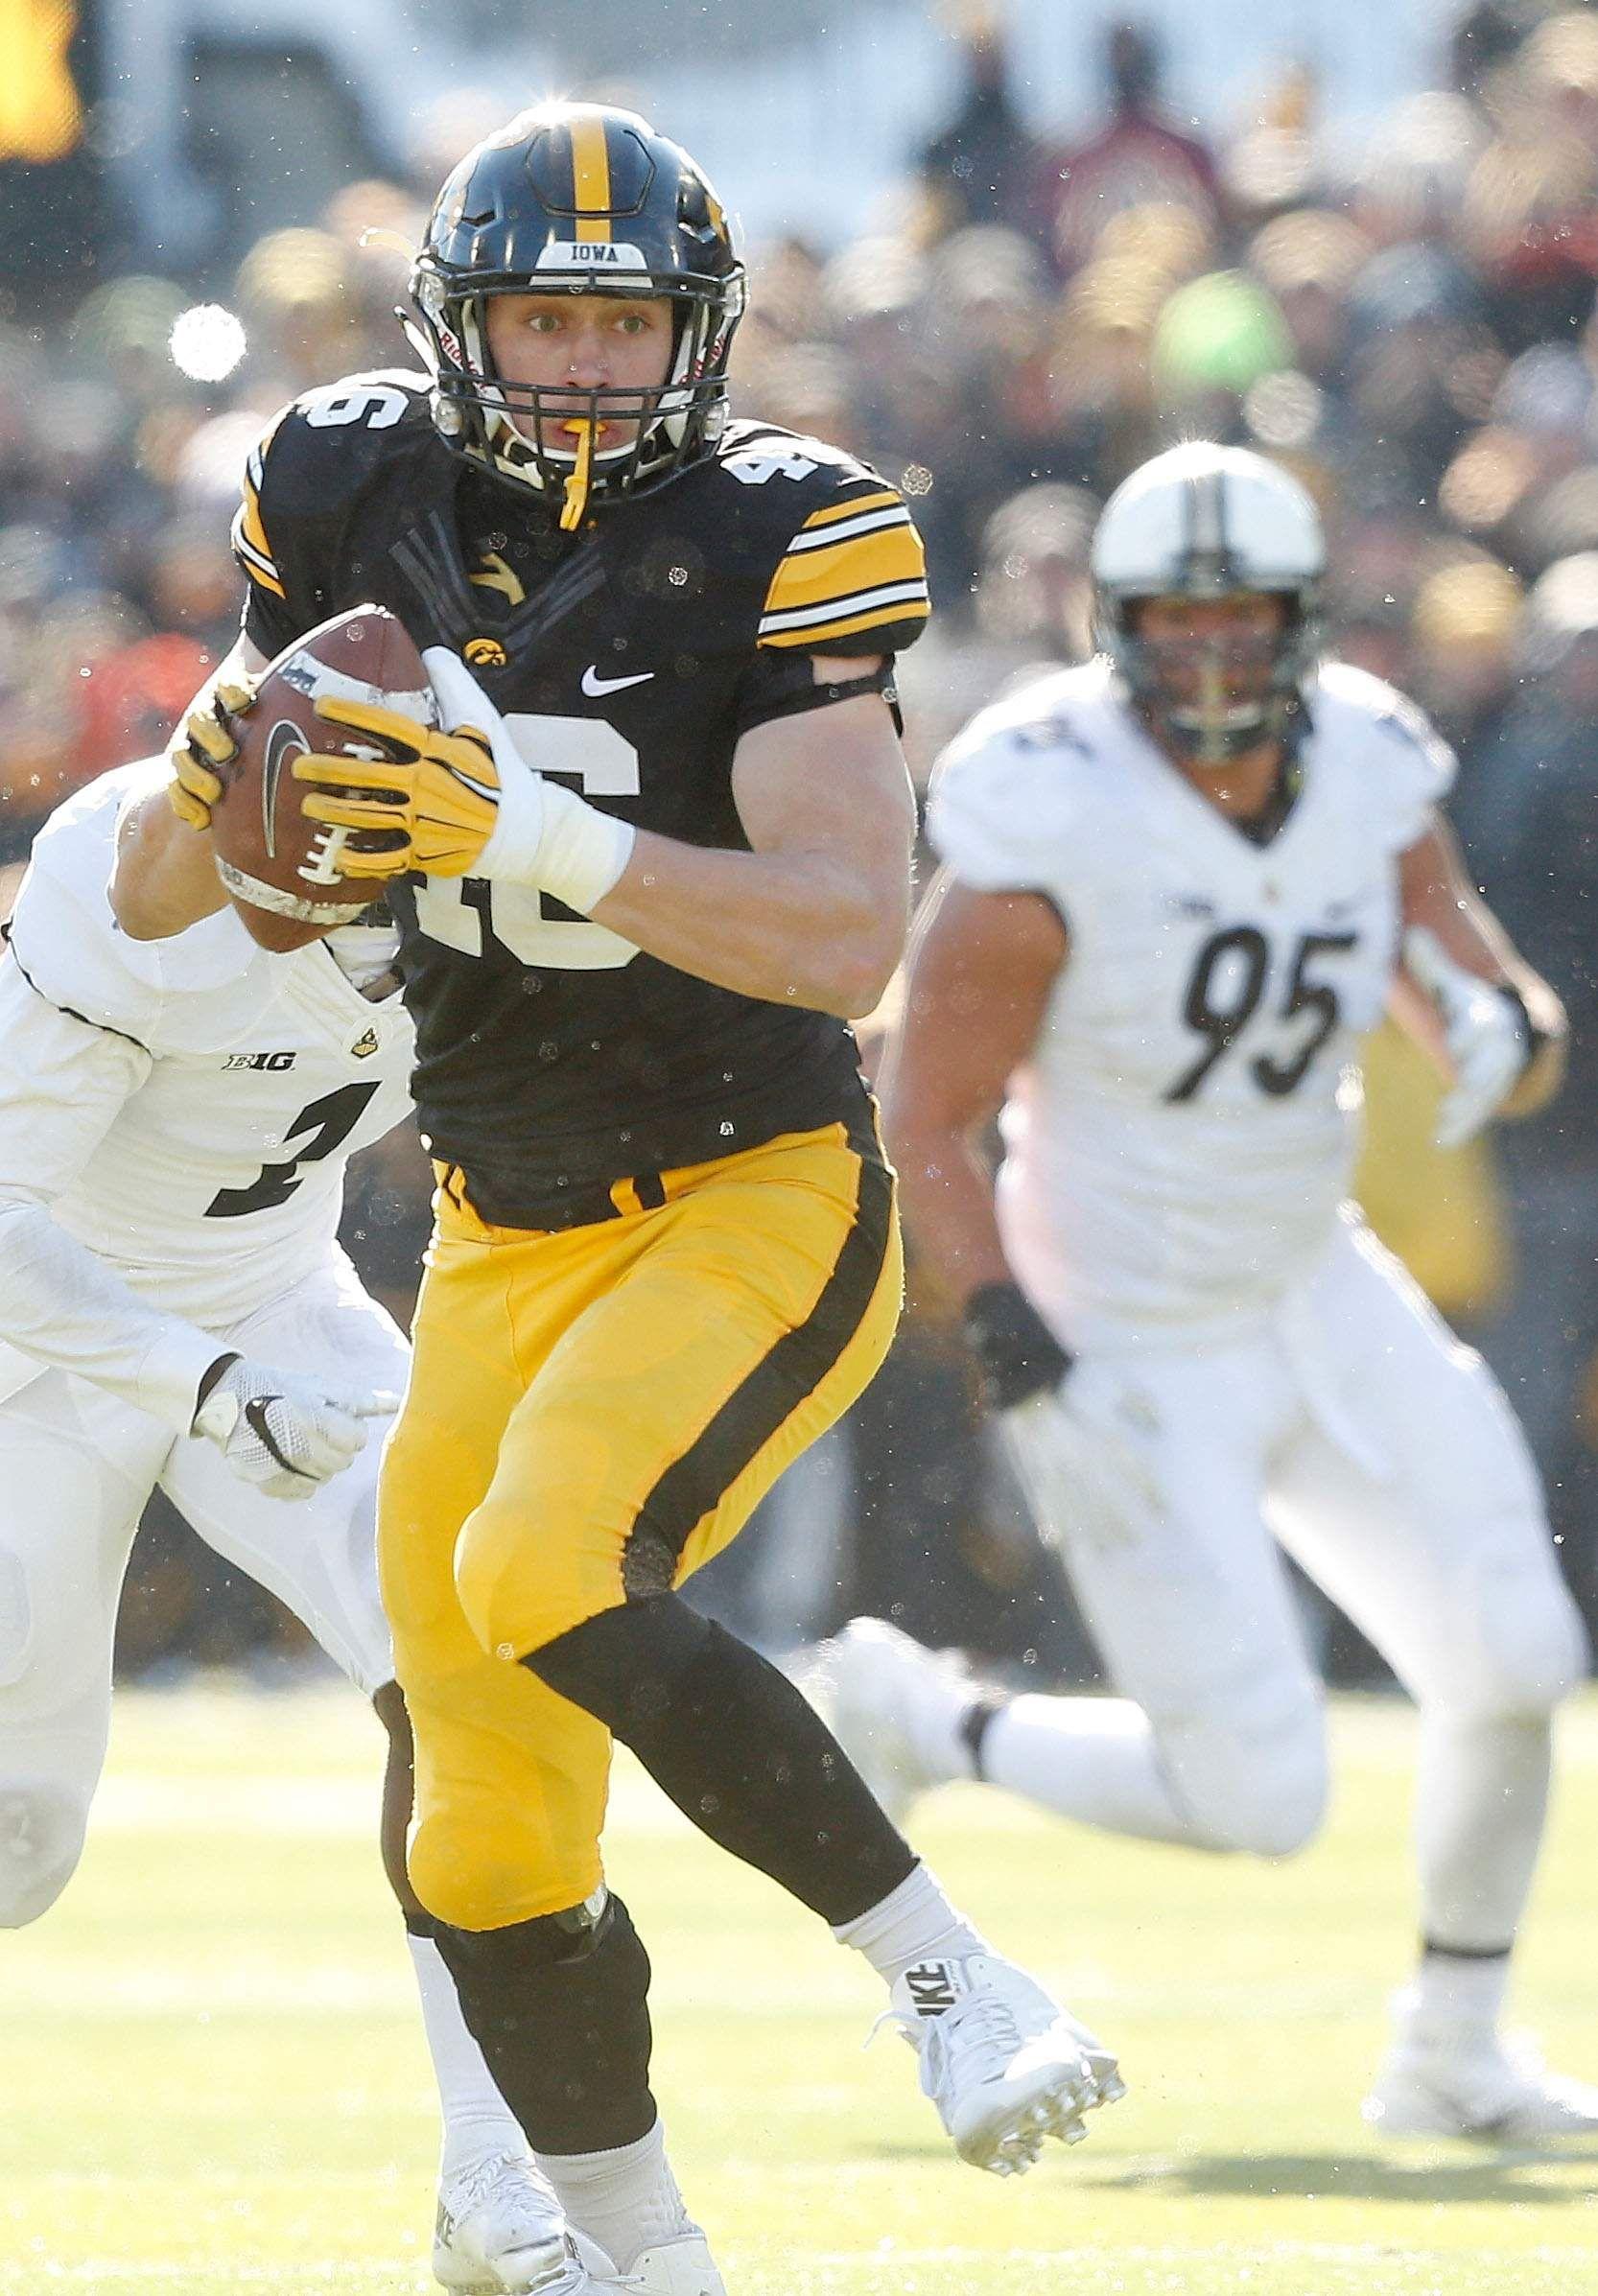 Iowa Tight Ends Parachute Into The Highlights The Gazette Tight End Iowa Football Helmets